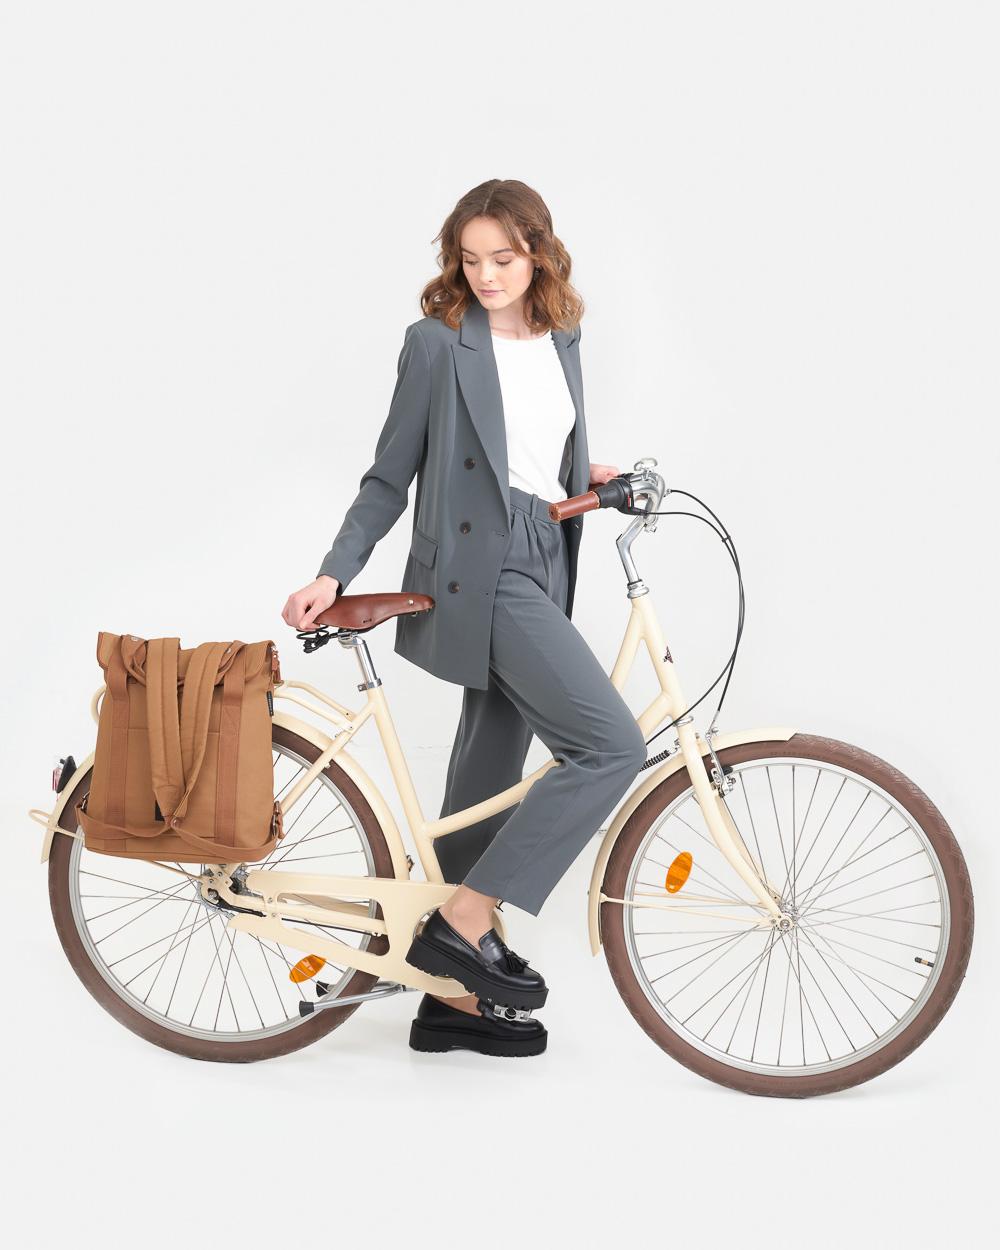 weathergoods-city-bikepack-xl-cognac-home-06-mobile-12